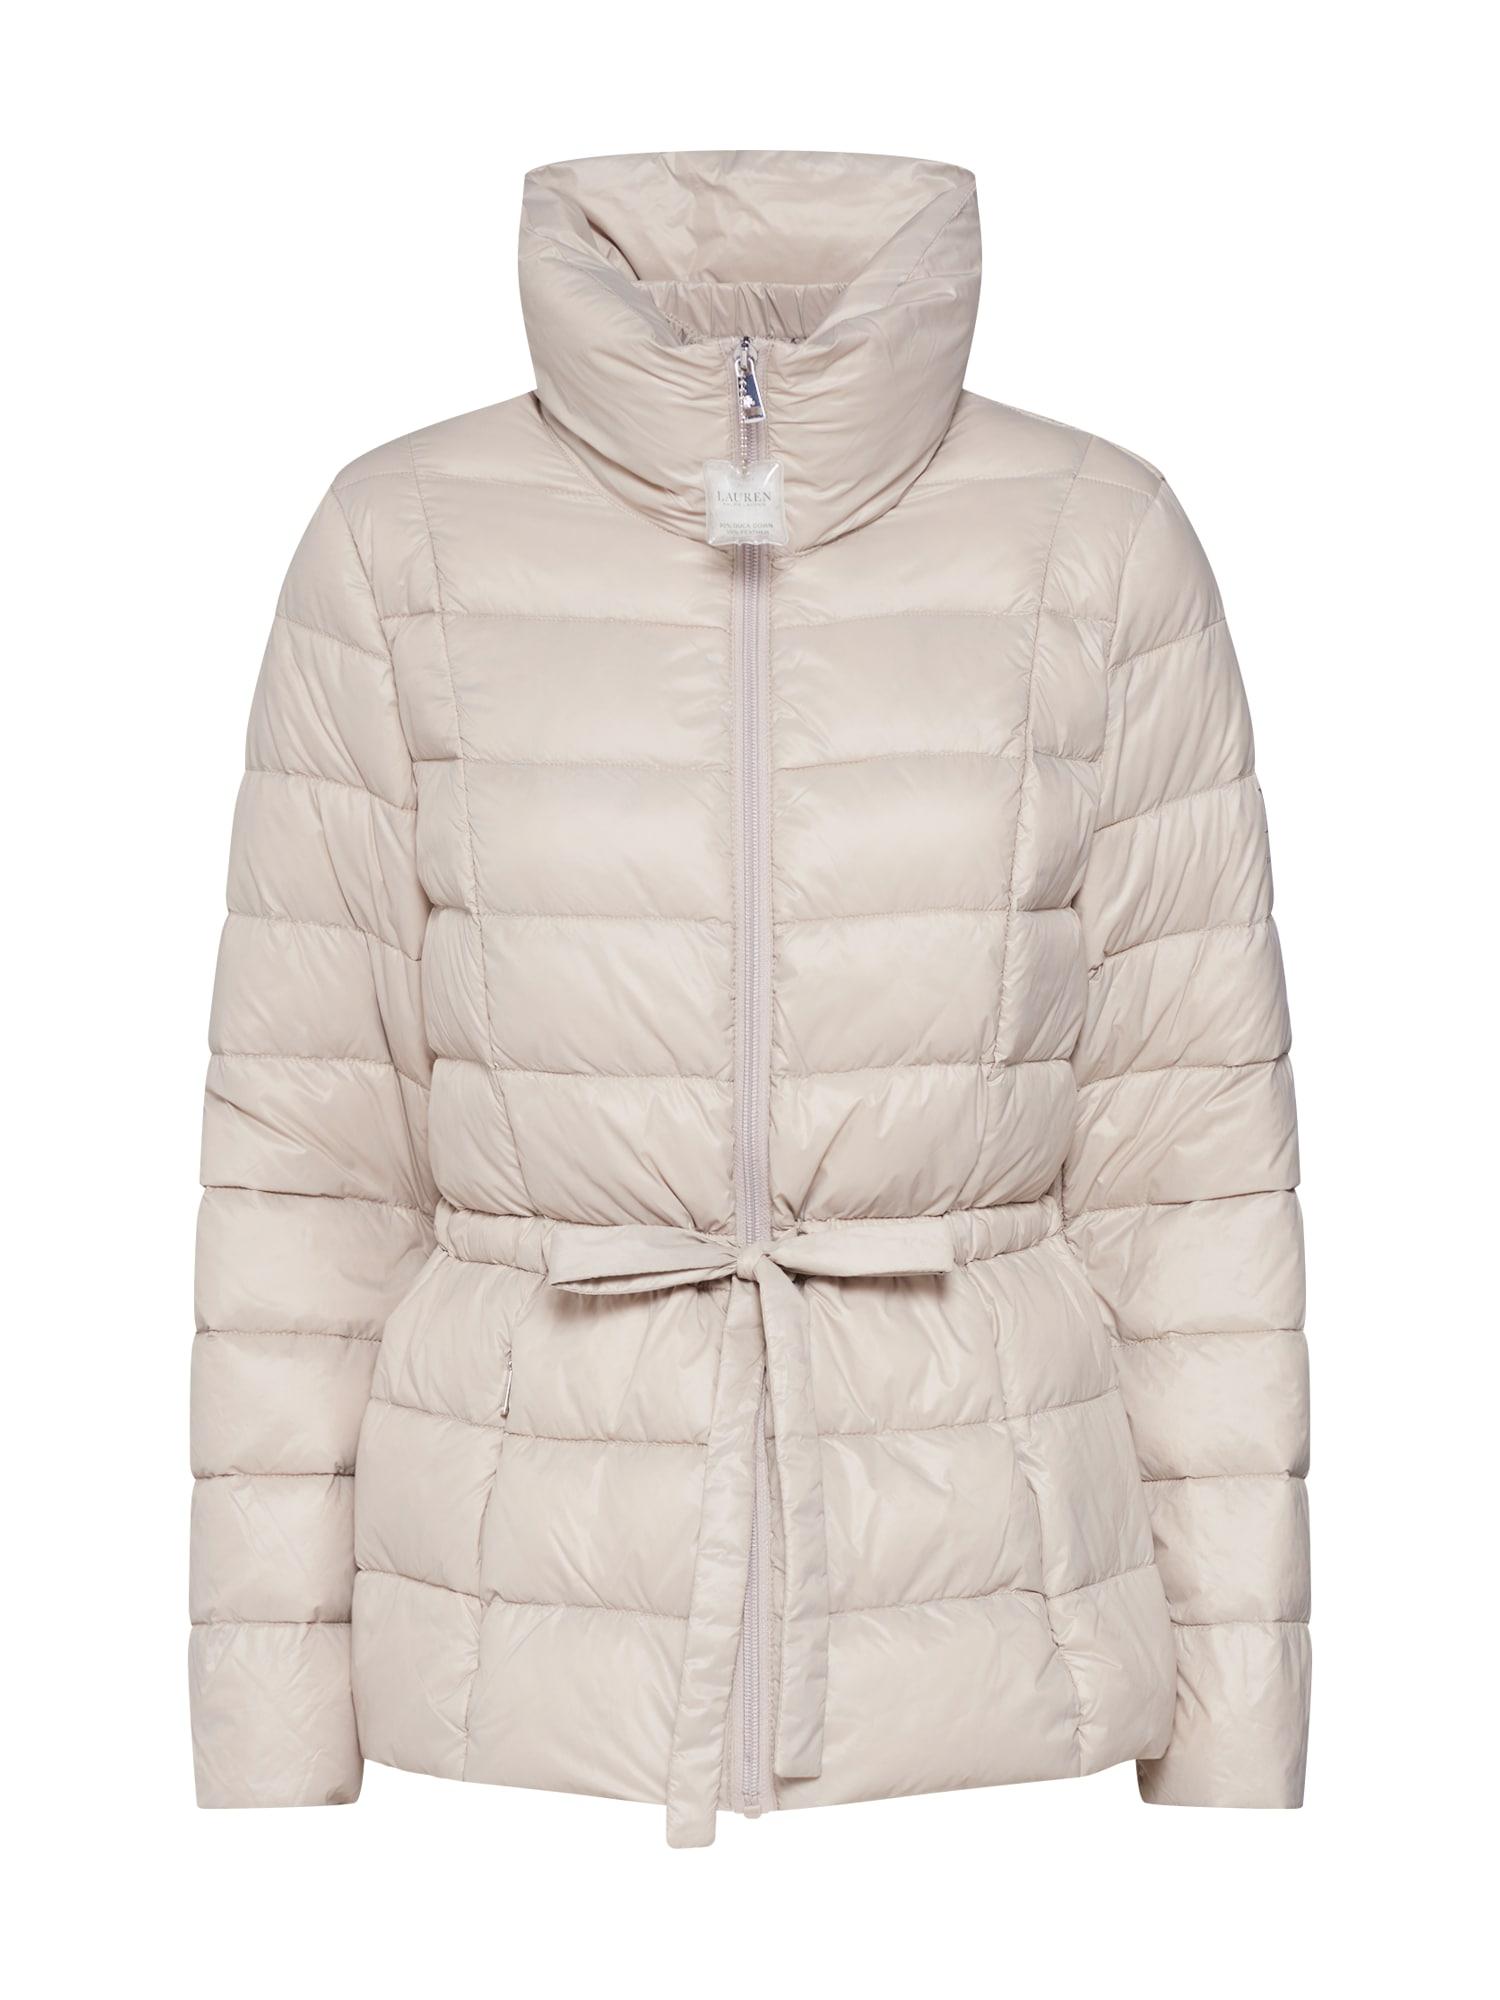 Zimní bunda PACKABLE RB-JACKET krémová Lauren Ralph Lauren